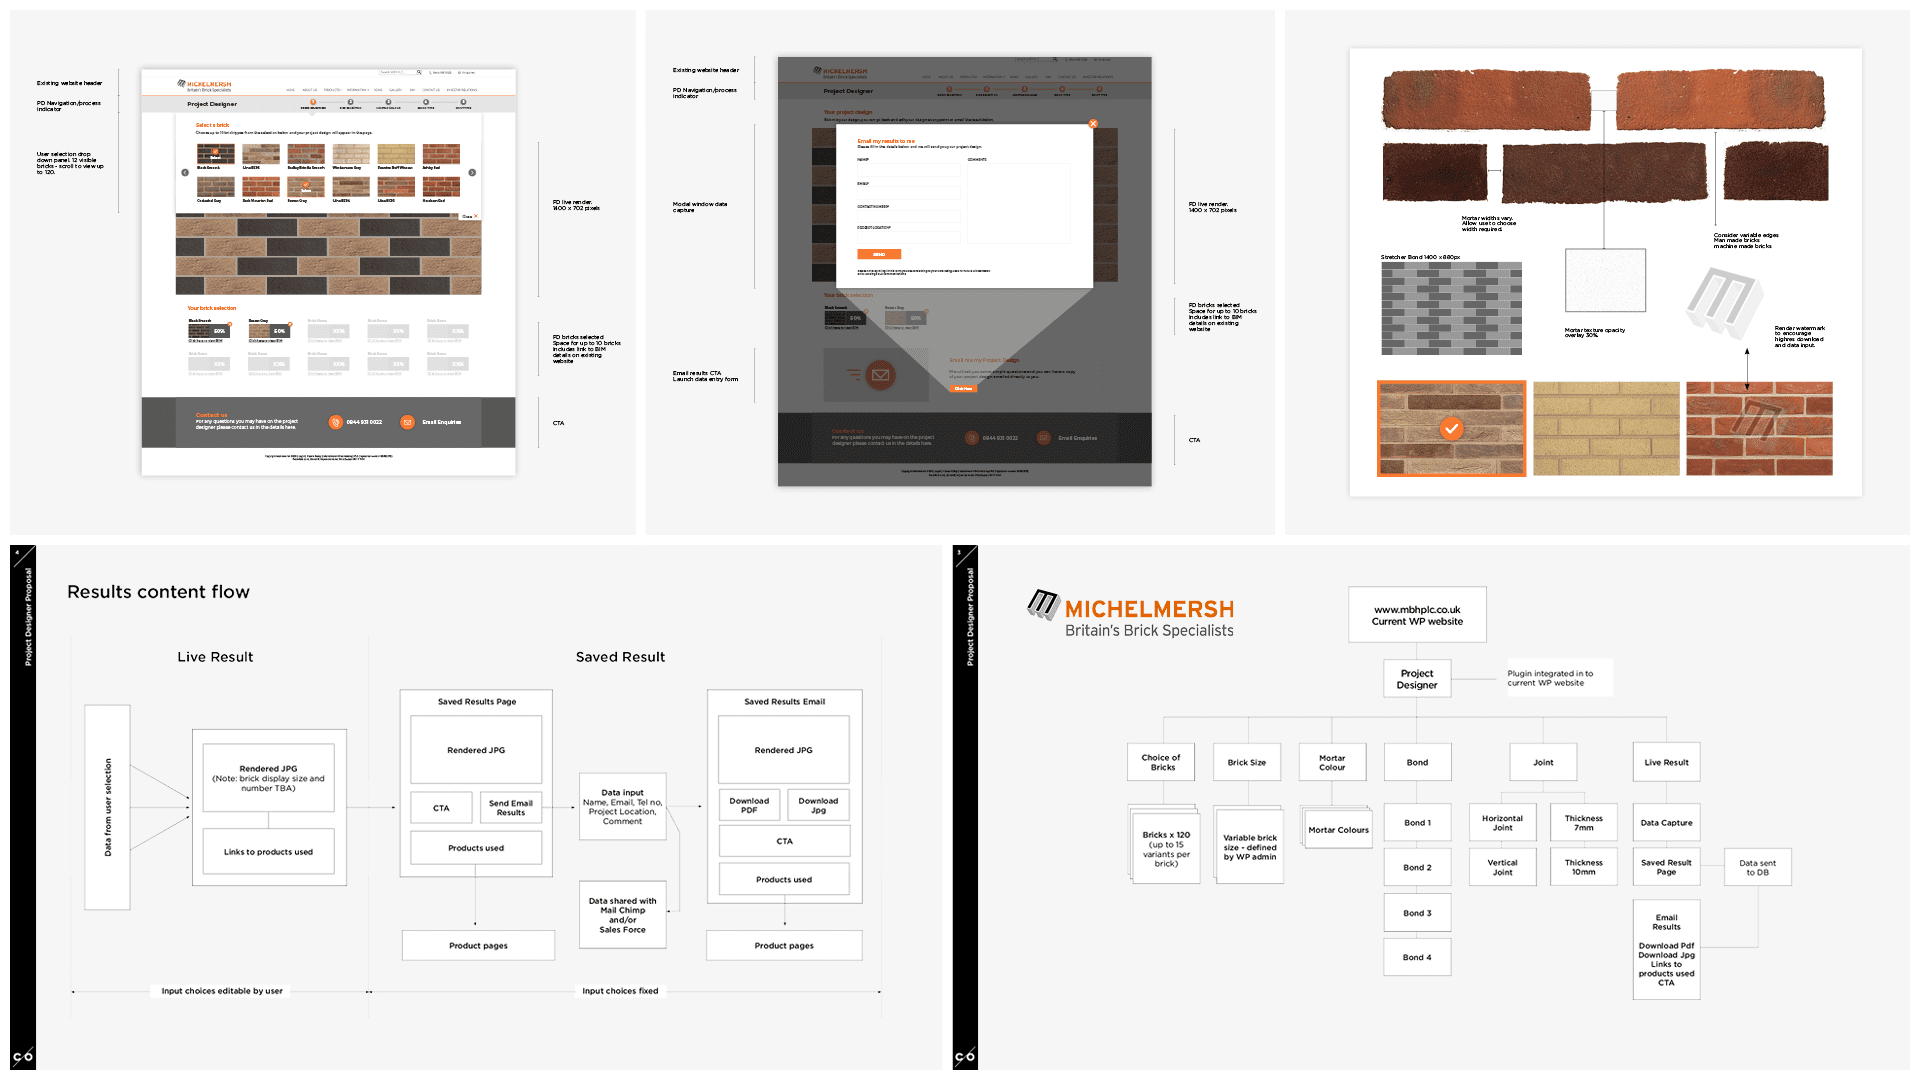 Michelmersh Façade Designer - Concepts, Cross Origin